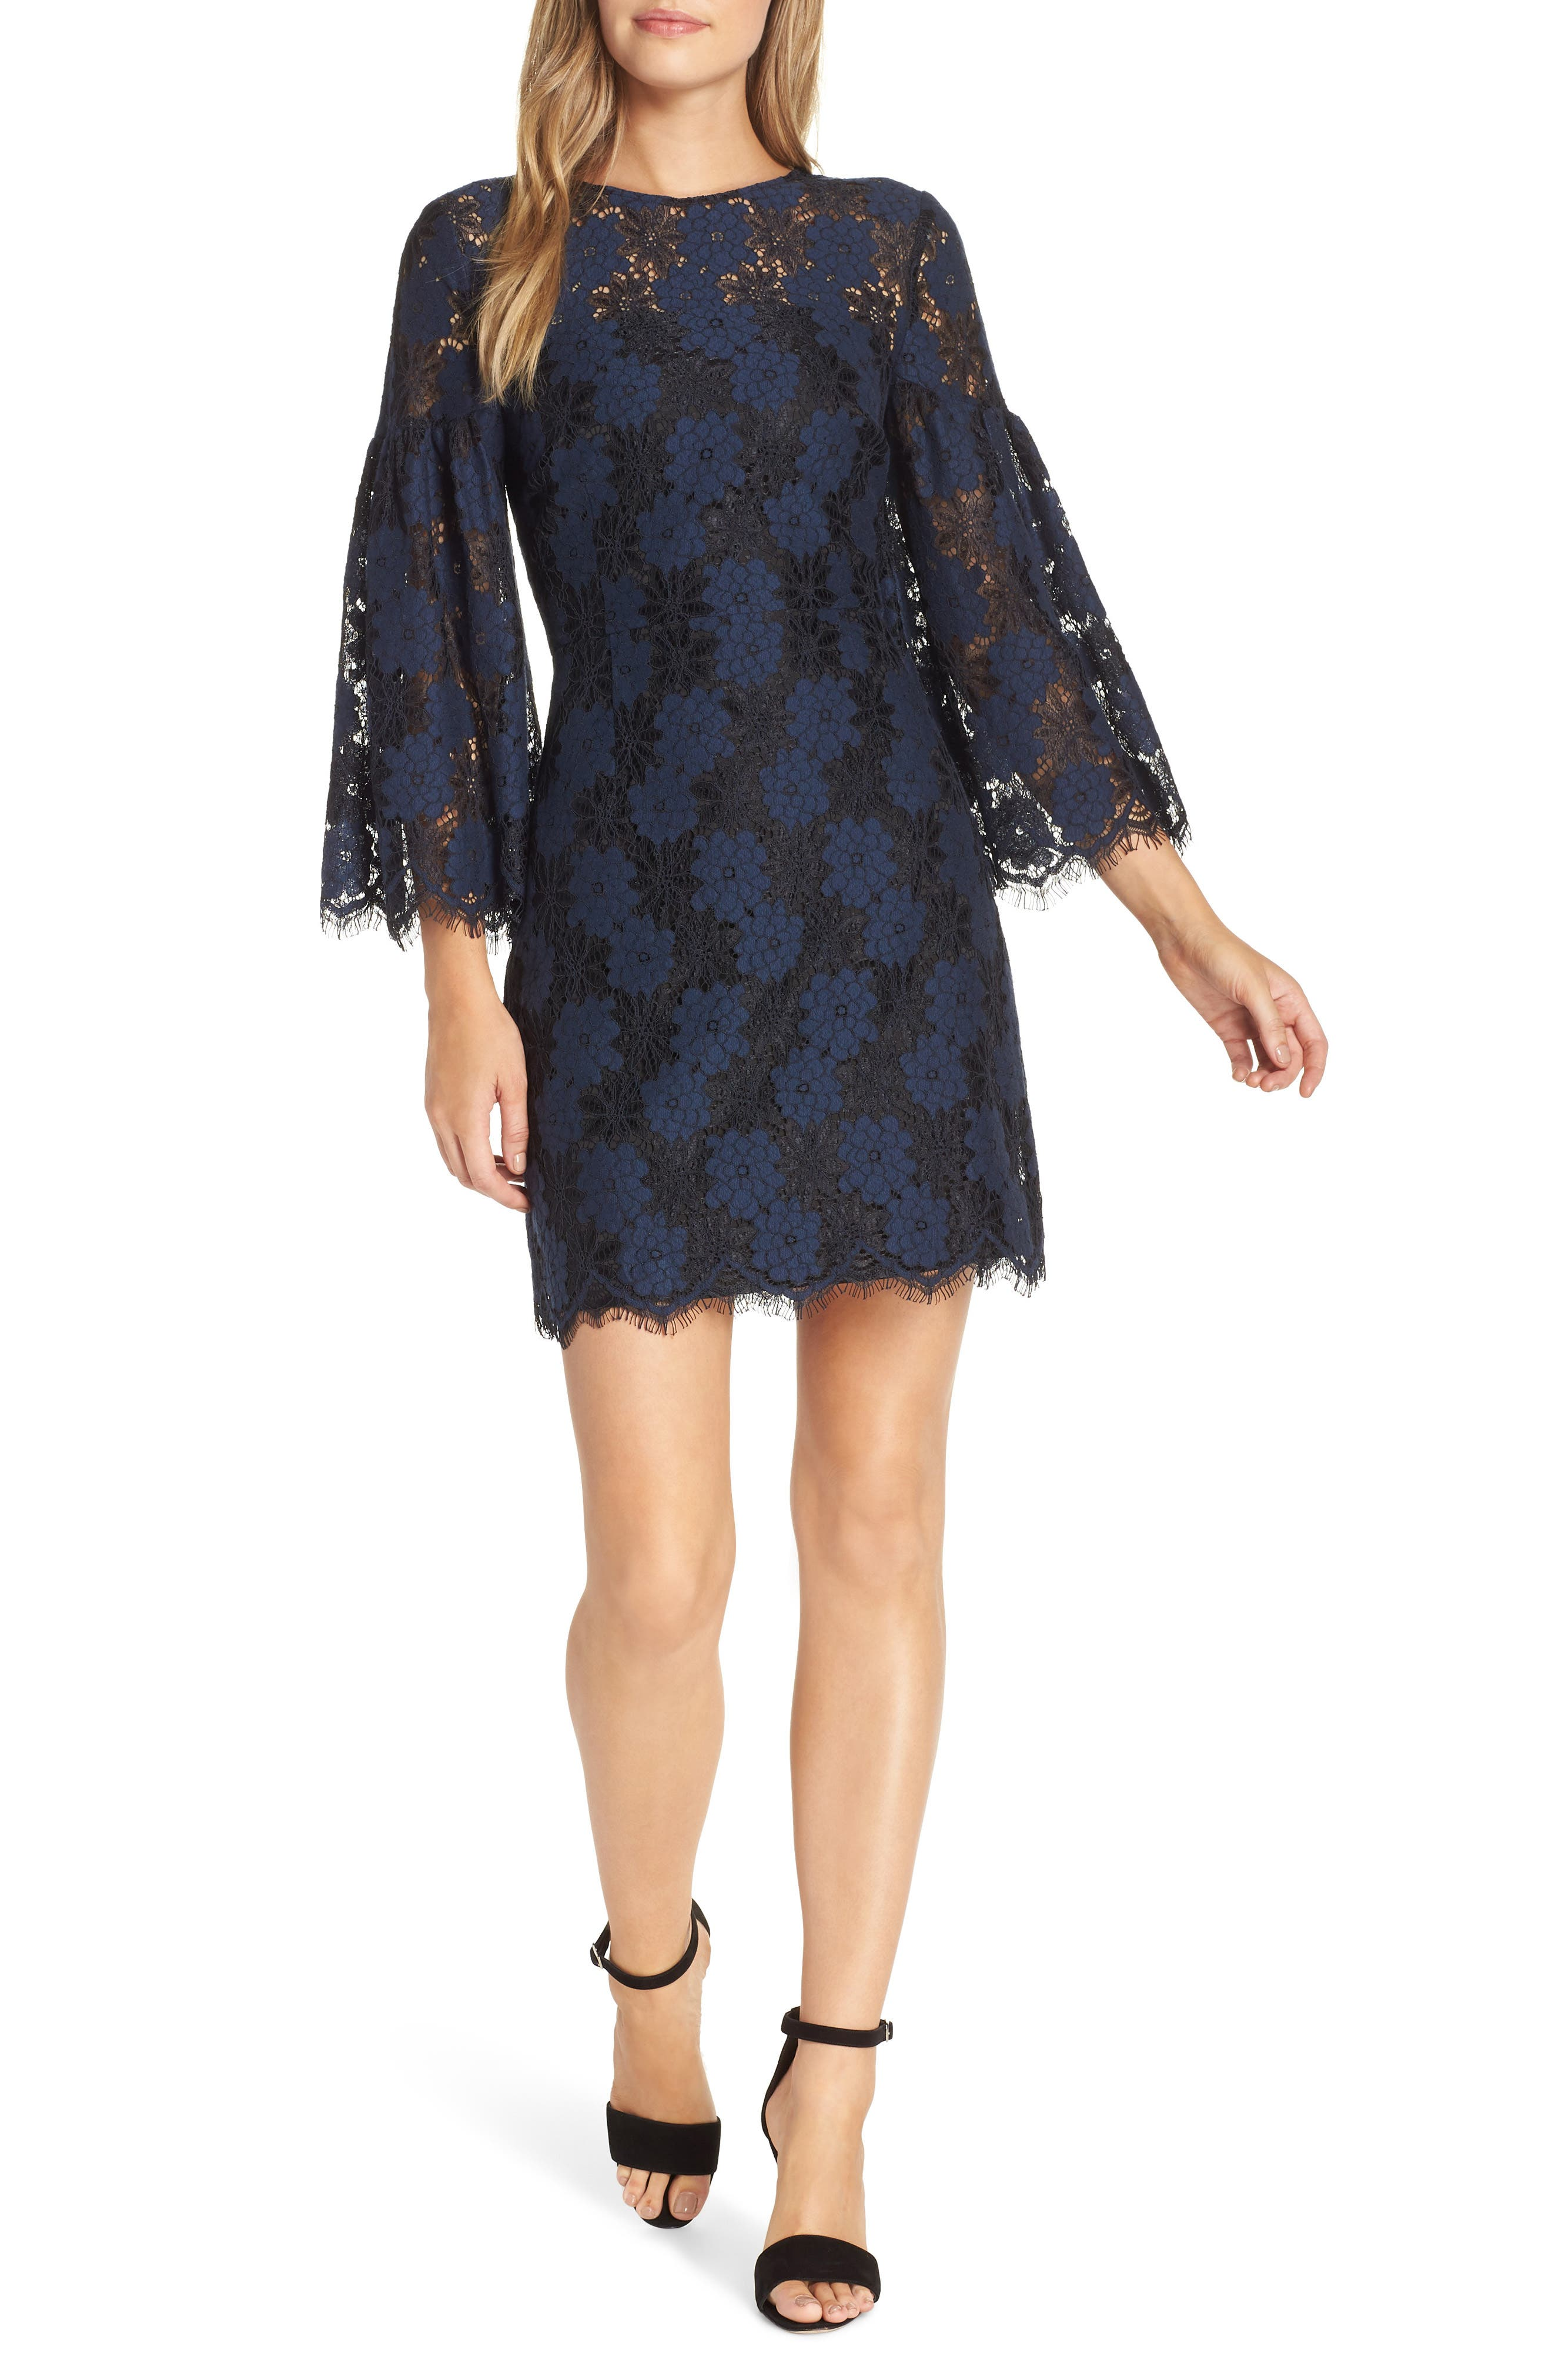 Two-Tone Lace Shift Dress,                             Main thumbnail 1, color,                             BLACK/ BLUE FLOWER